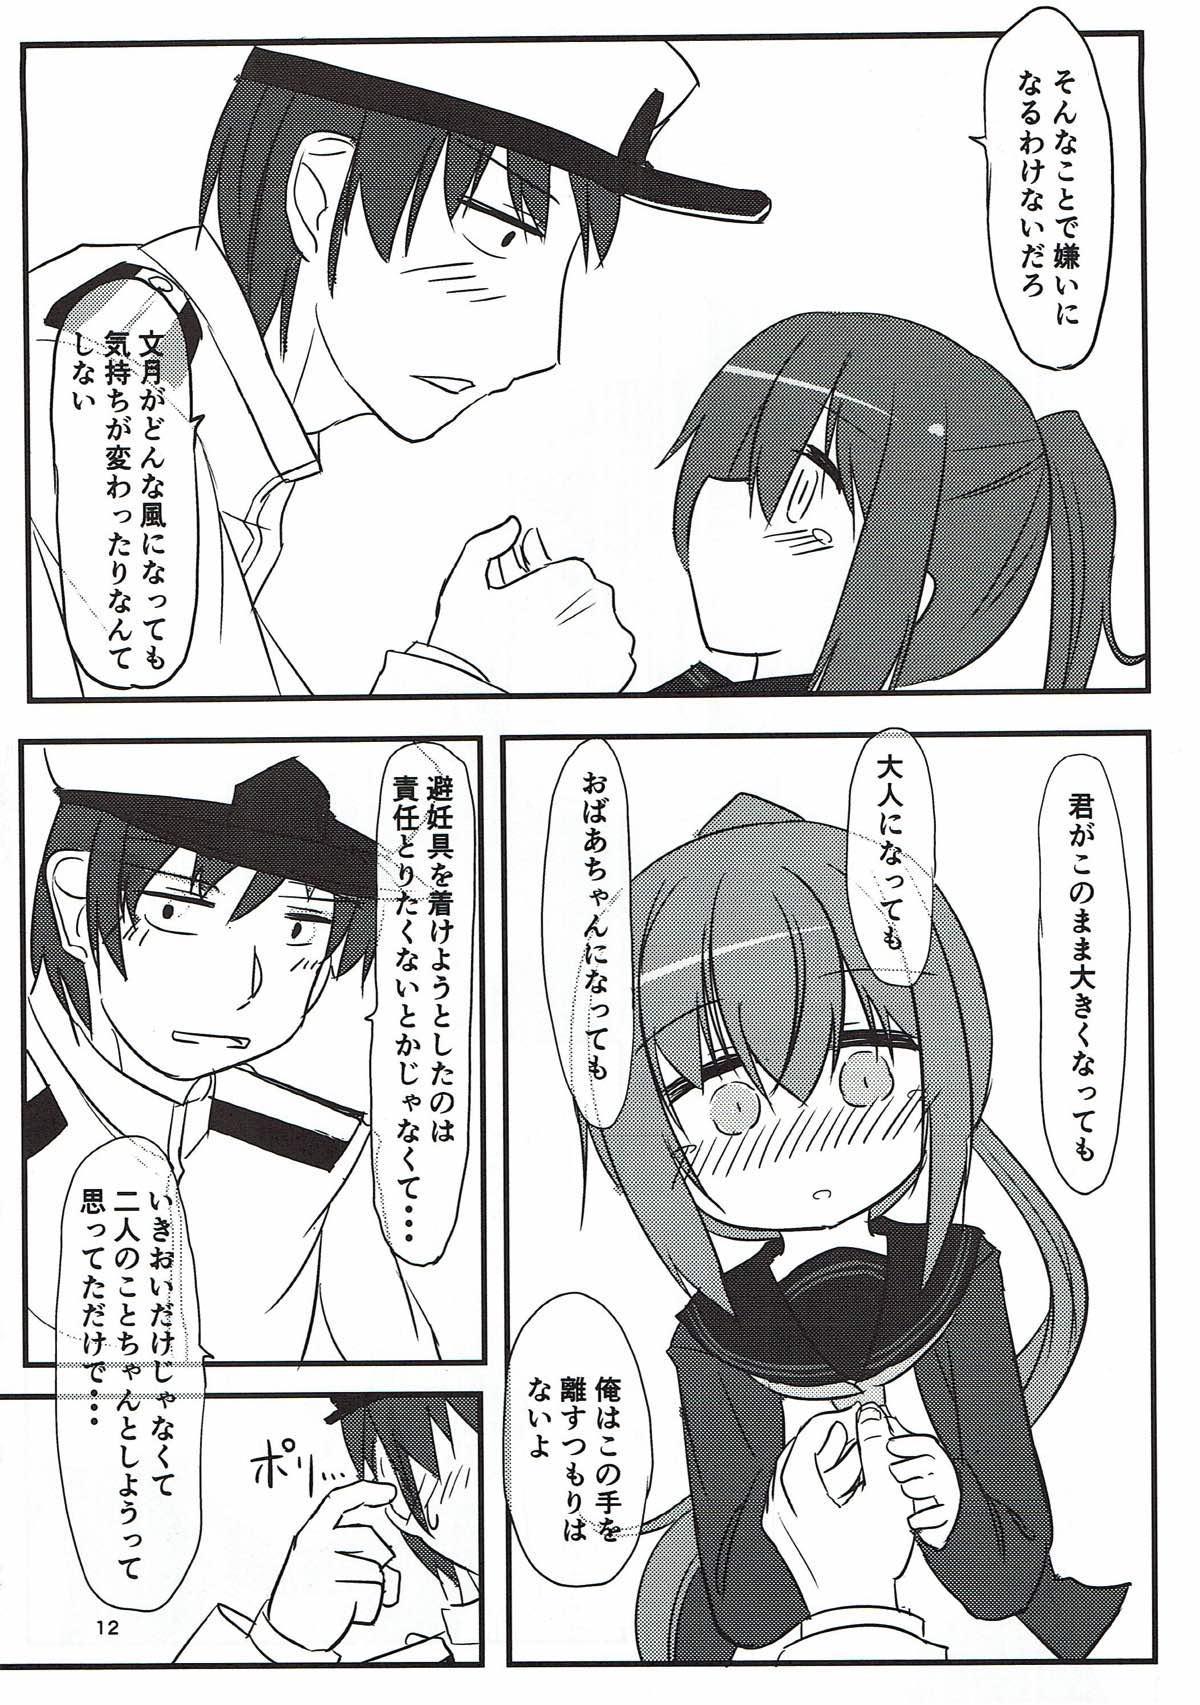 Fumizuki datte Chanto Dekirun dakara! 10